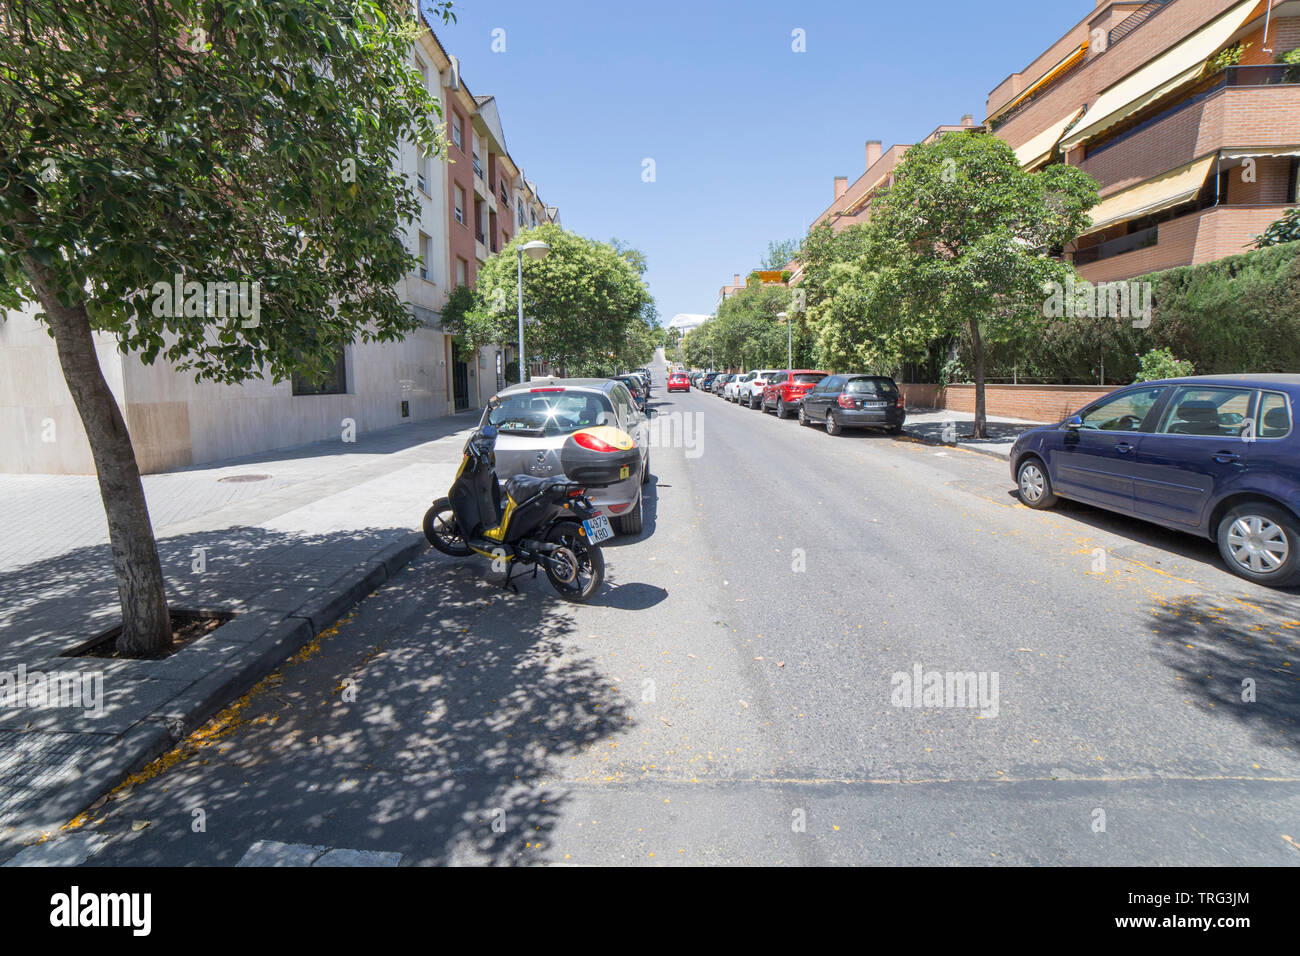 Cordoba, Spain - May 30th, 2019: Norte Sierra district. Cordoba, Spain. Escultor Gomez del Rio street - Stock Image